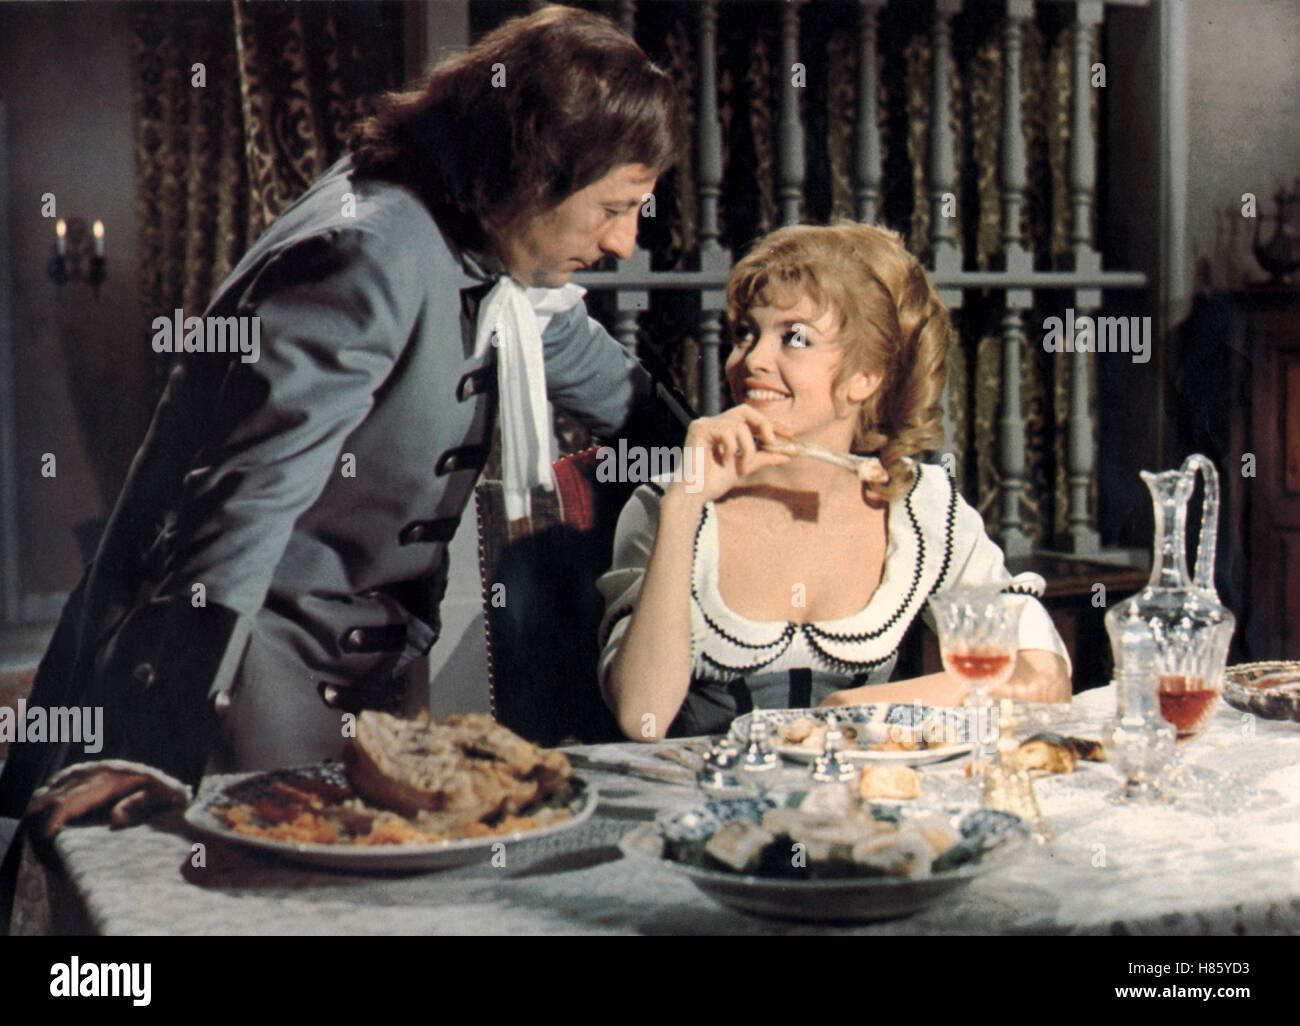 angelique angelique marquise des anges f 1964 regie bernard stock photo royalty free